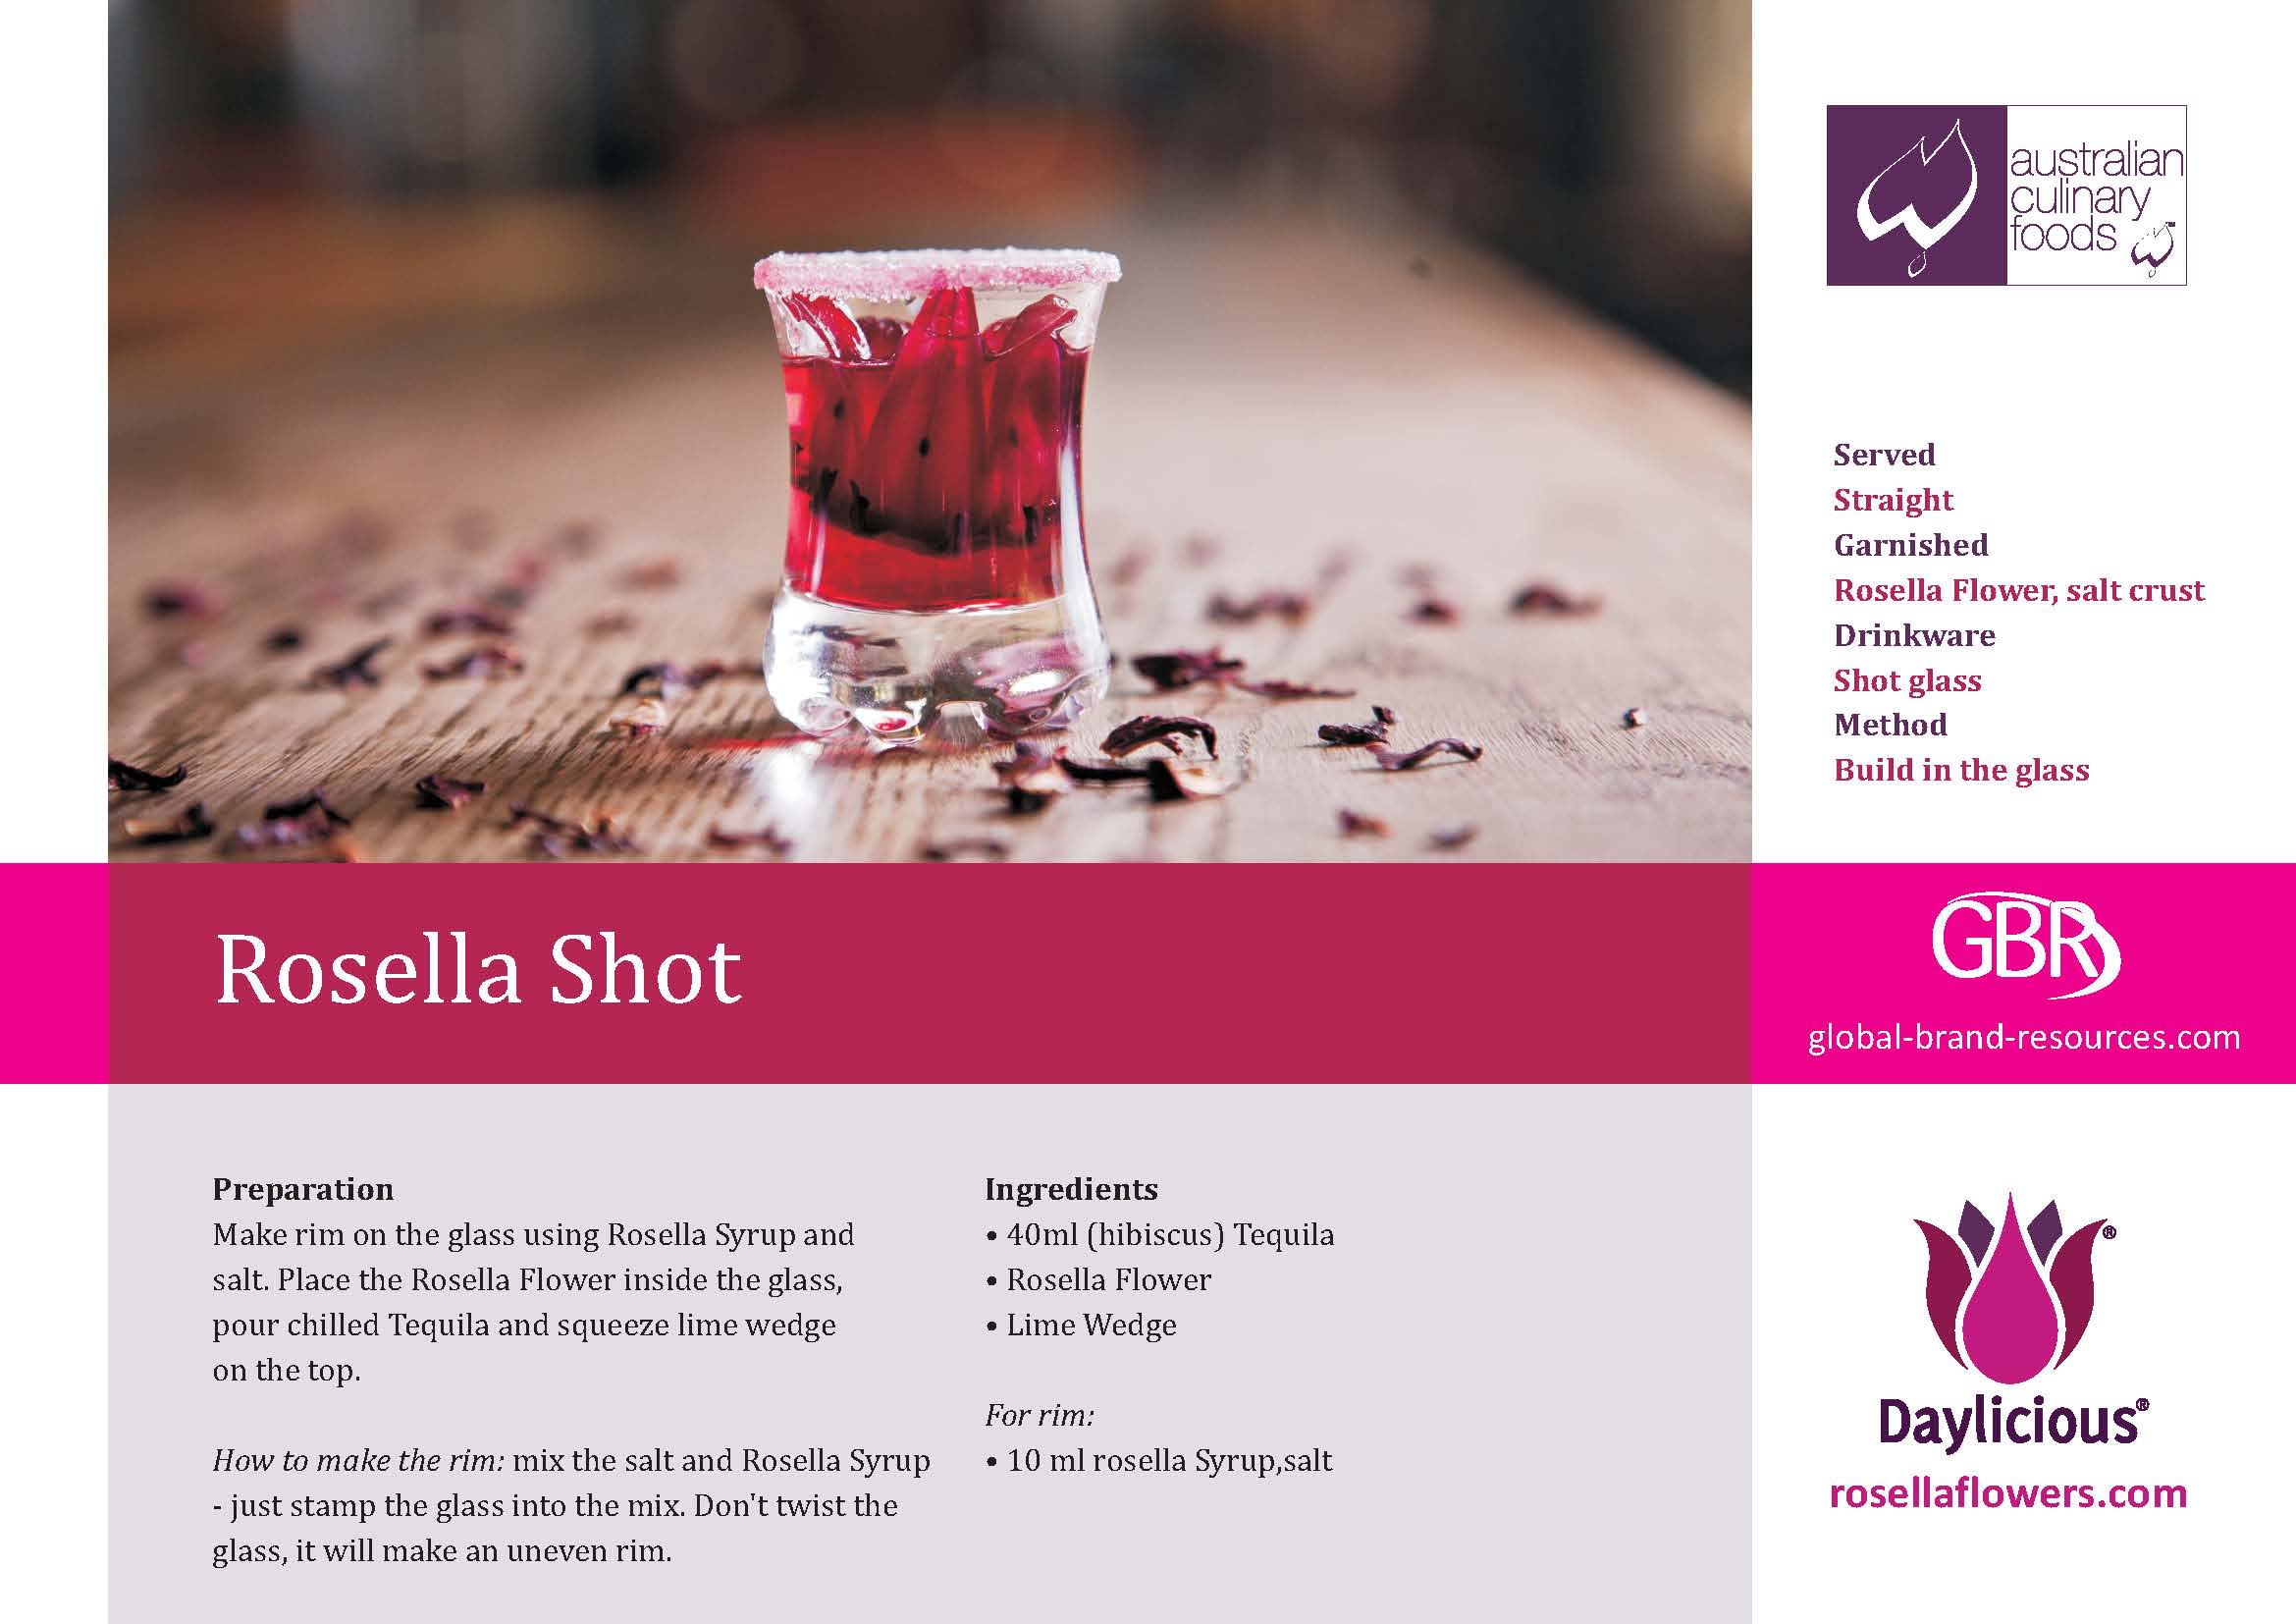 Rosella Shot